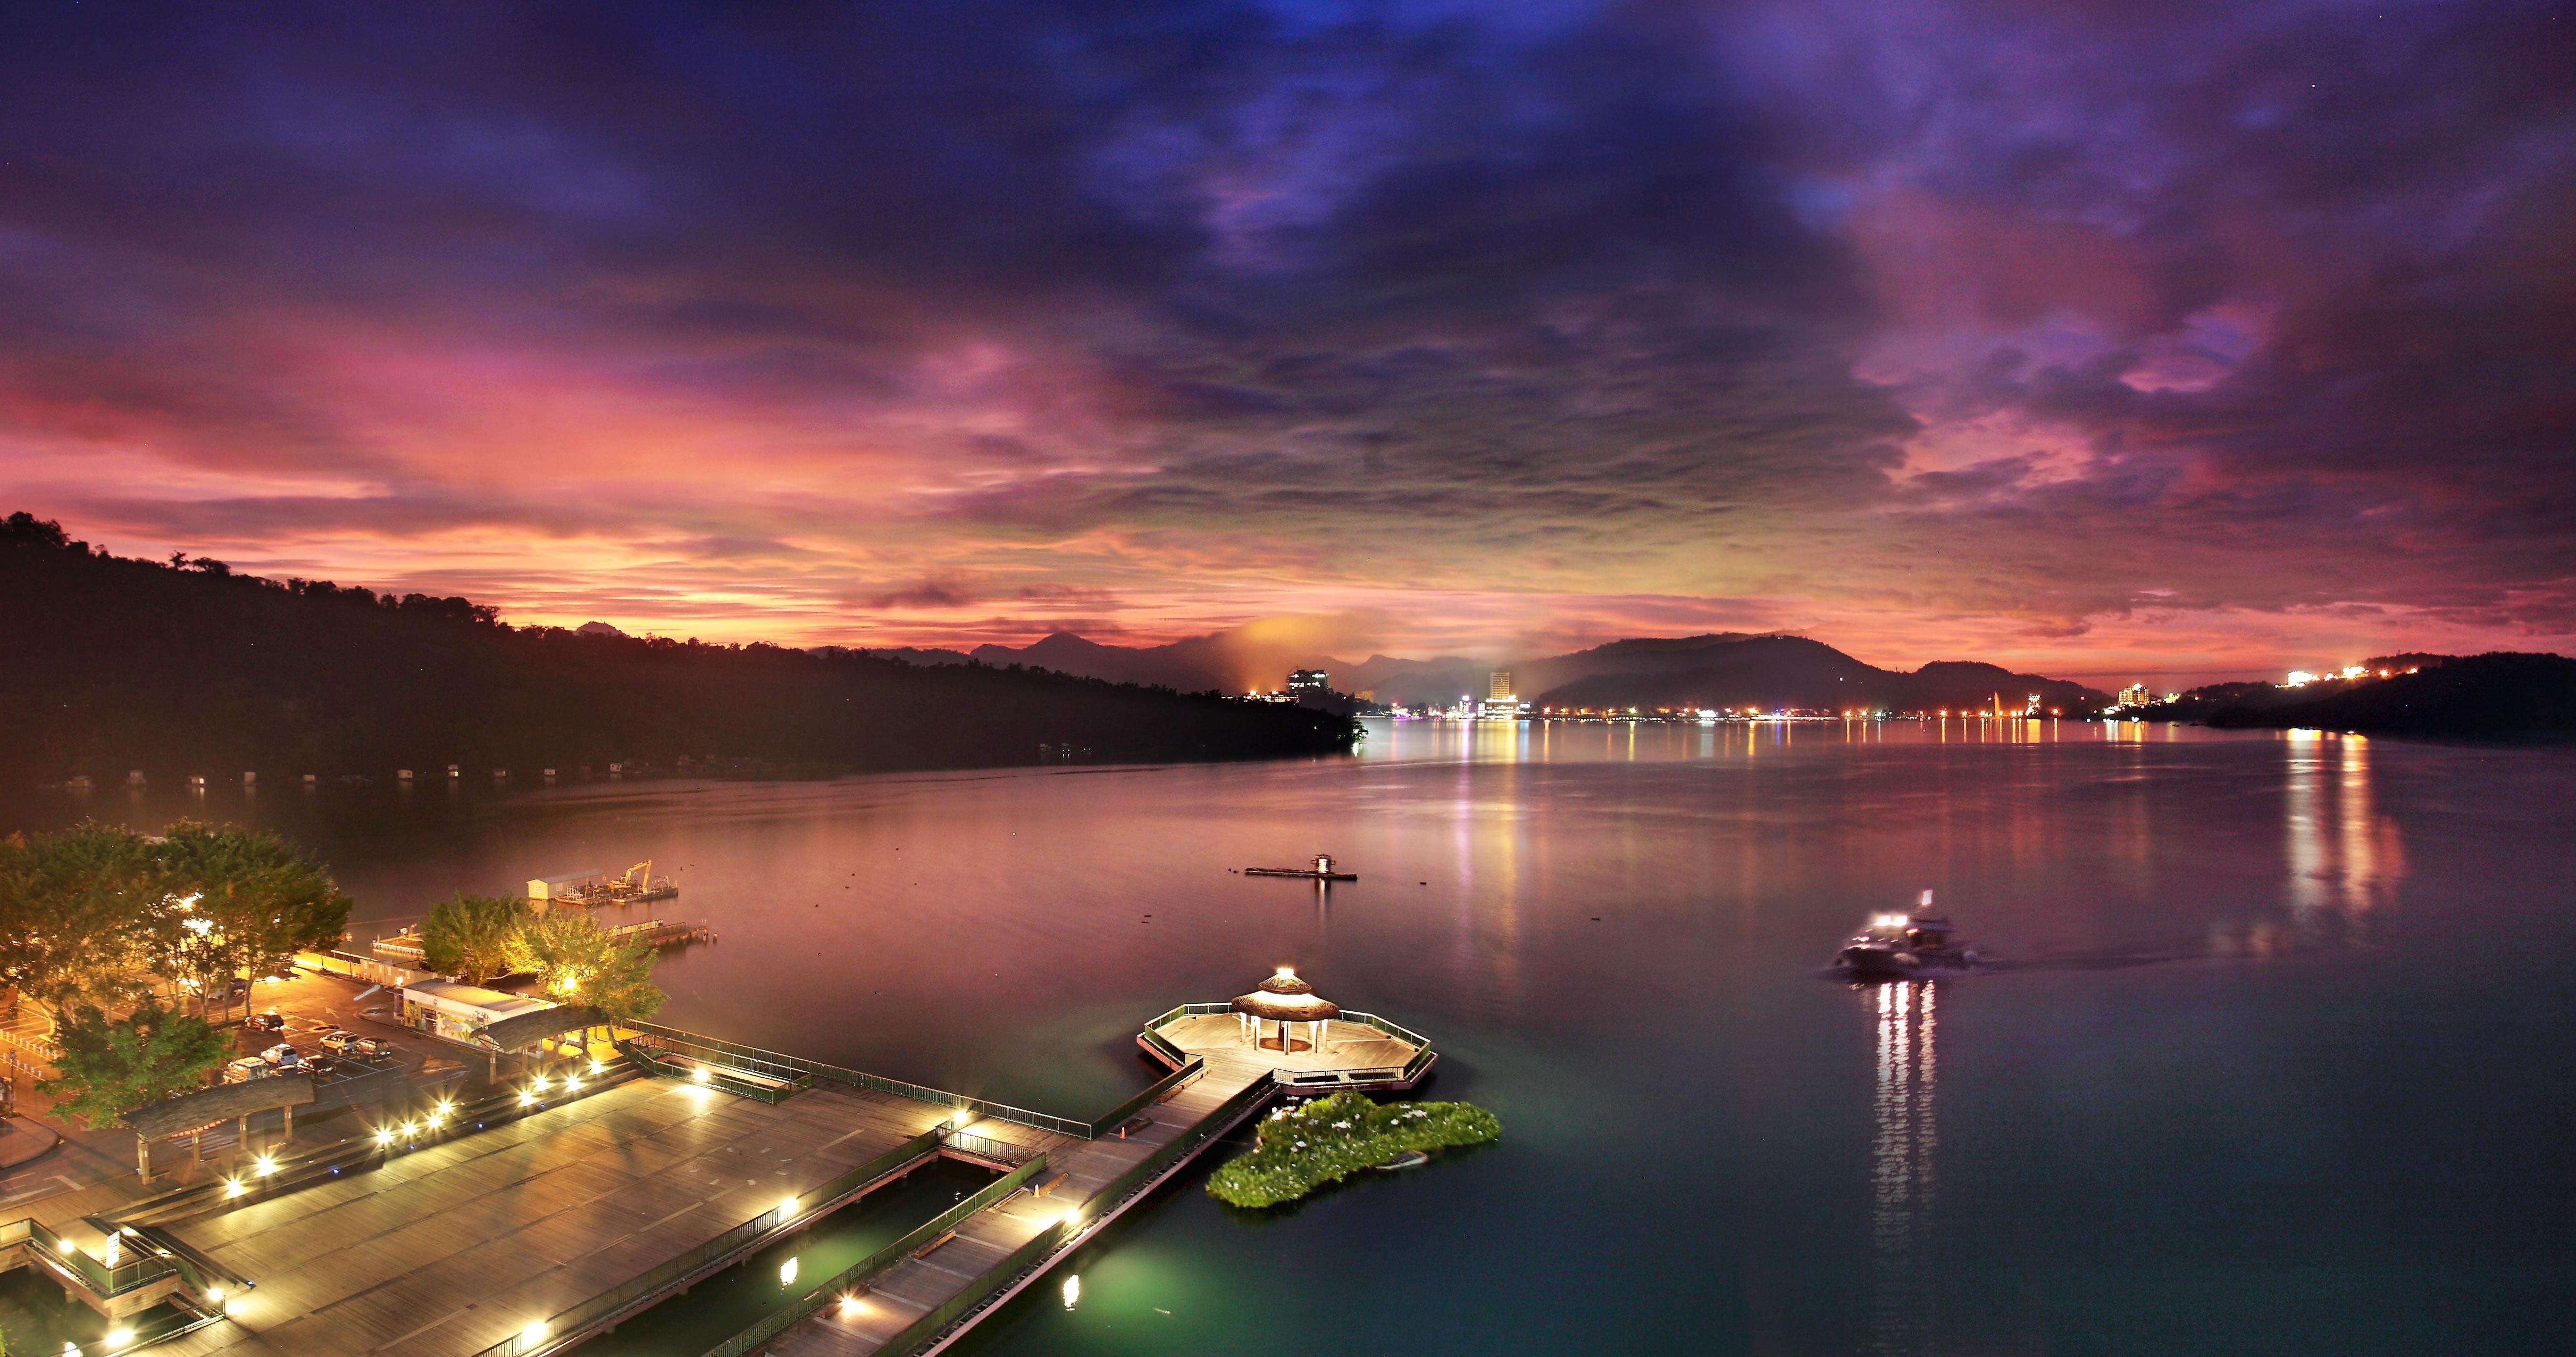 The Crystal Resort Sun Moon Lake, Nantou